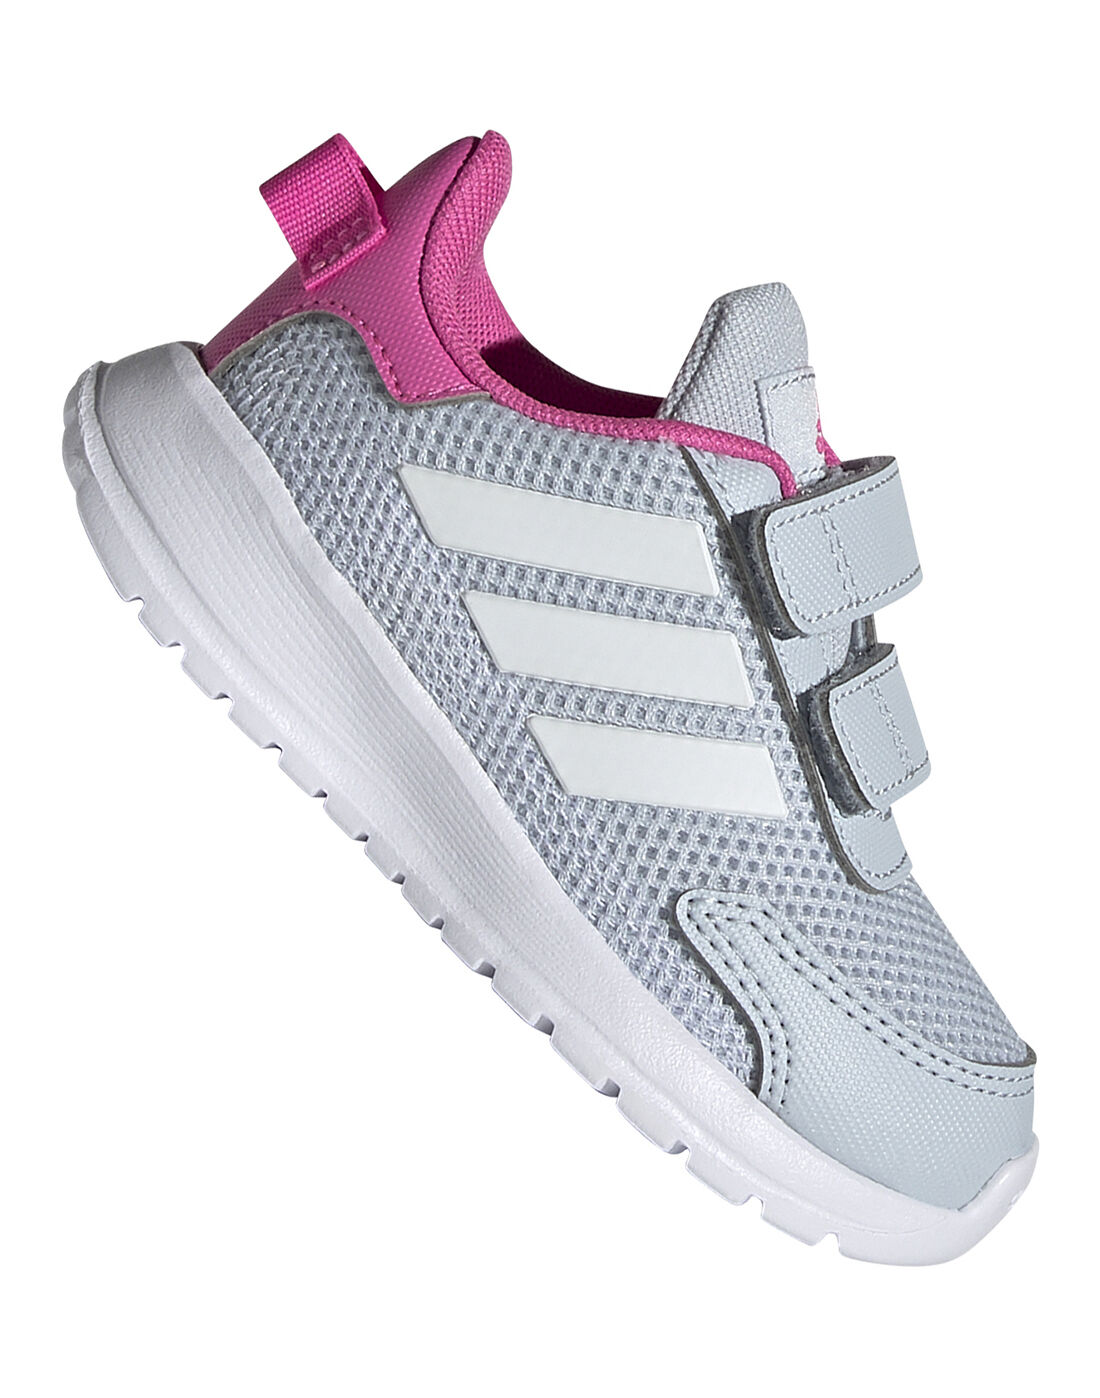 adidas nike huarache 4 lacrosse purple boots boys   Infant Girls Tensaur Run